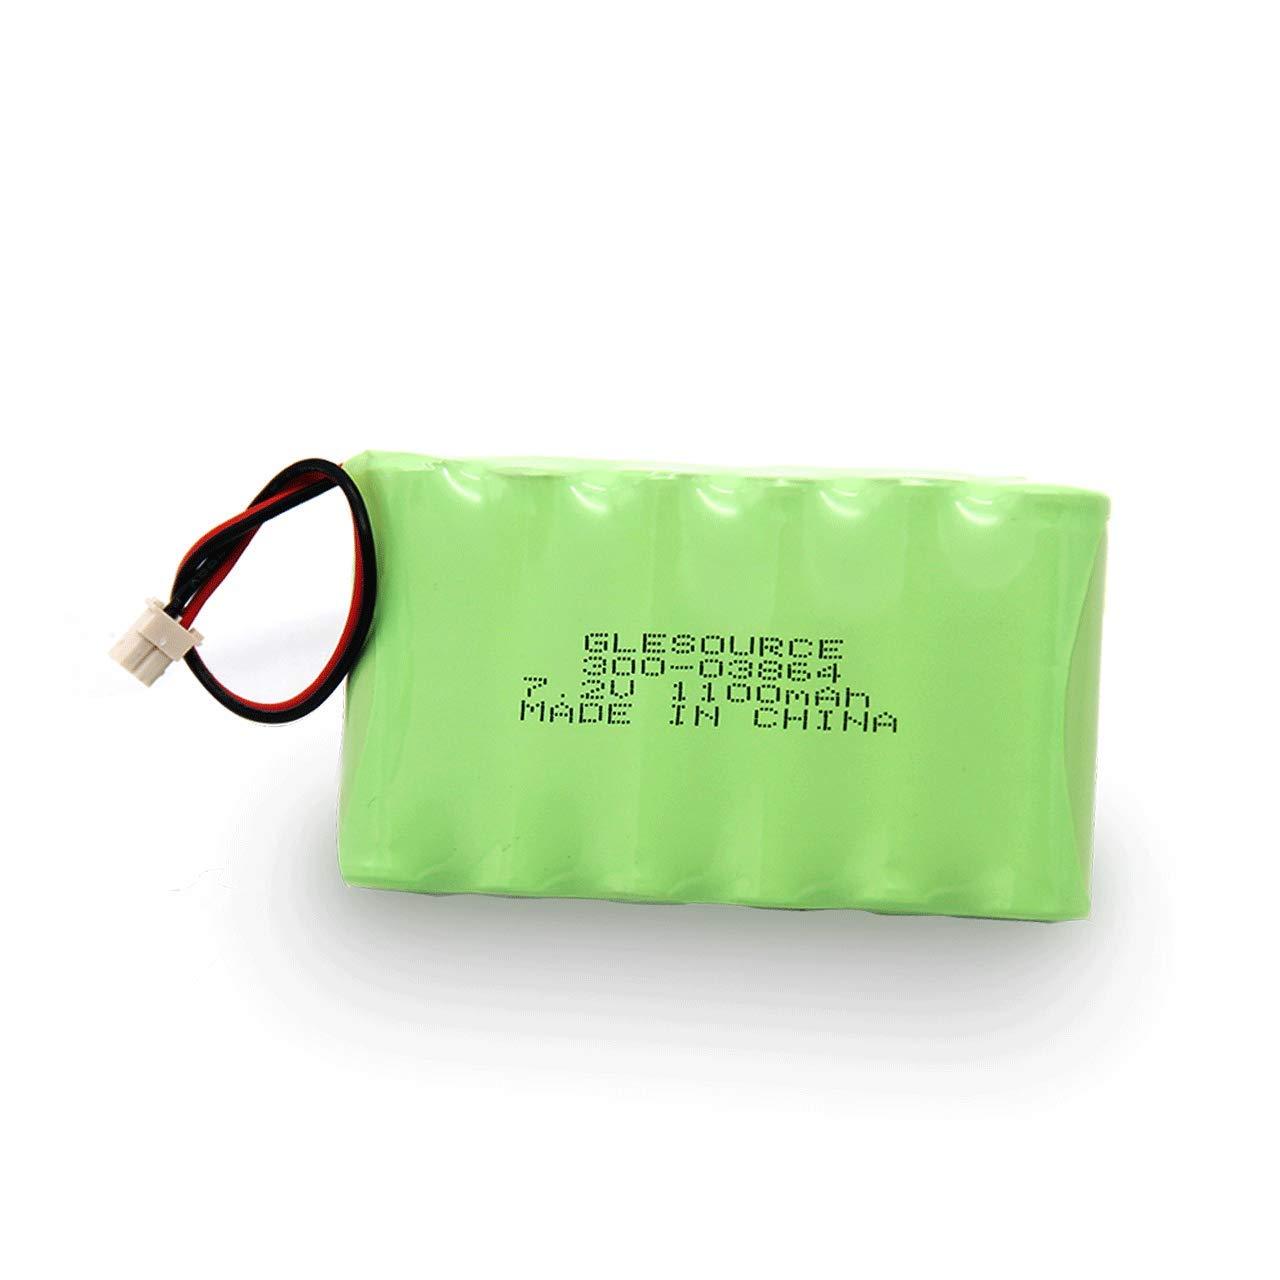 GLESOURCE 300-03864-1 1100mAh Backup Battery for ADT ADI Ademco Lynx WALYNX-RCHB-SC Honeywell Lynx Touch K5109, L3000, L5000, L5100 by GLESOURCE